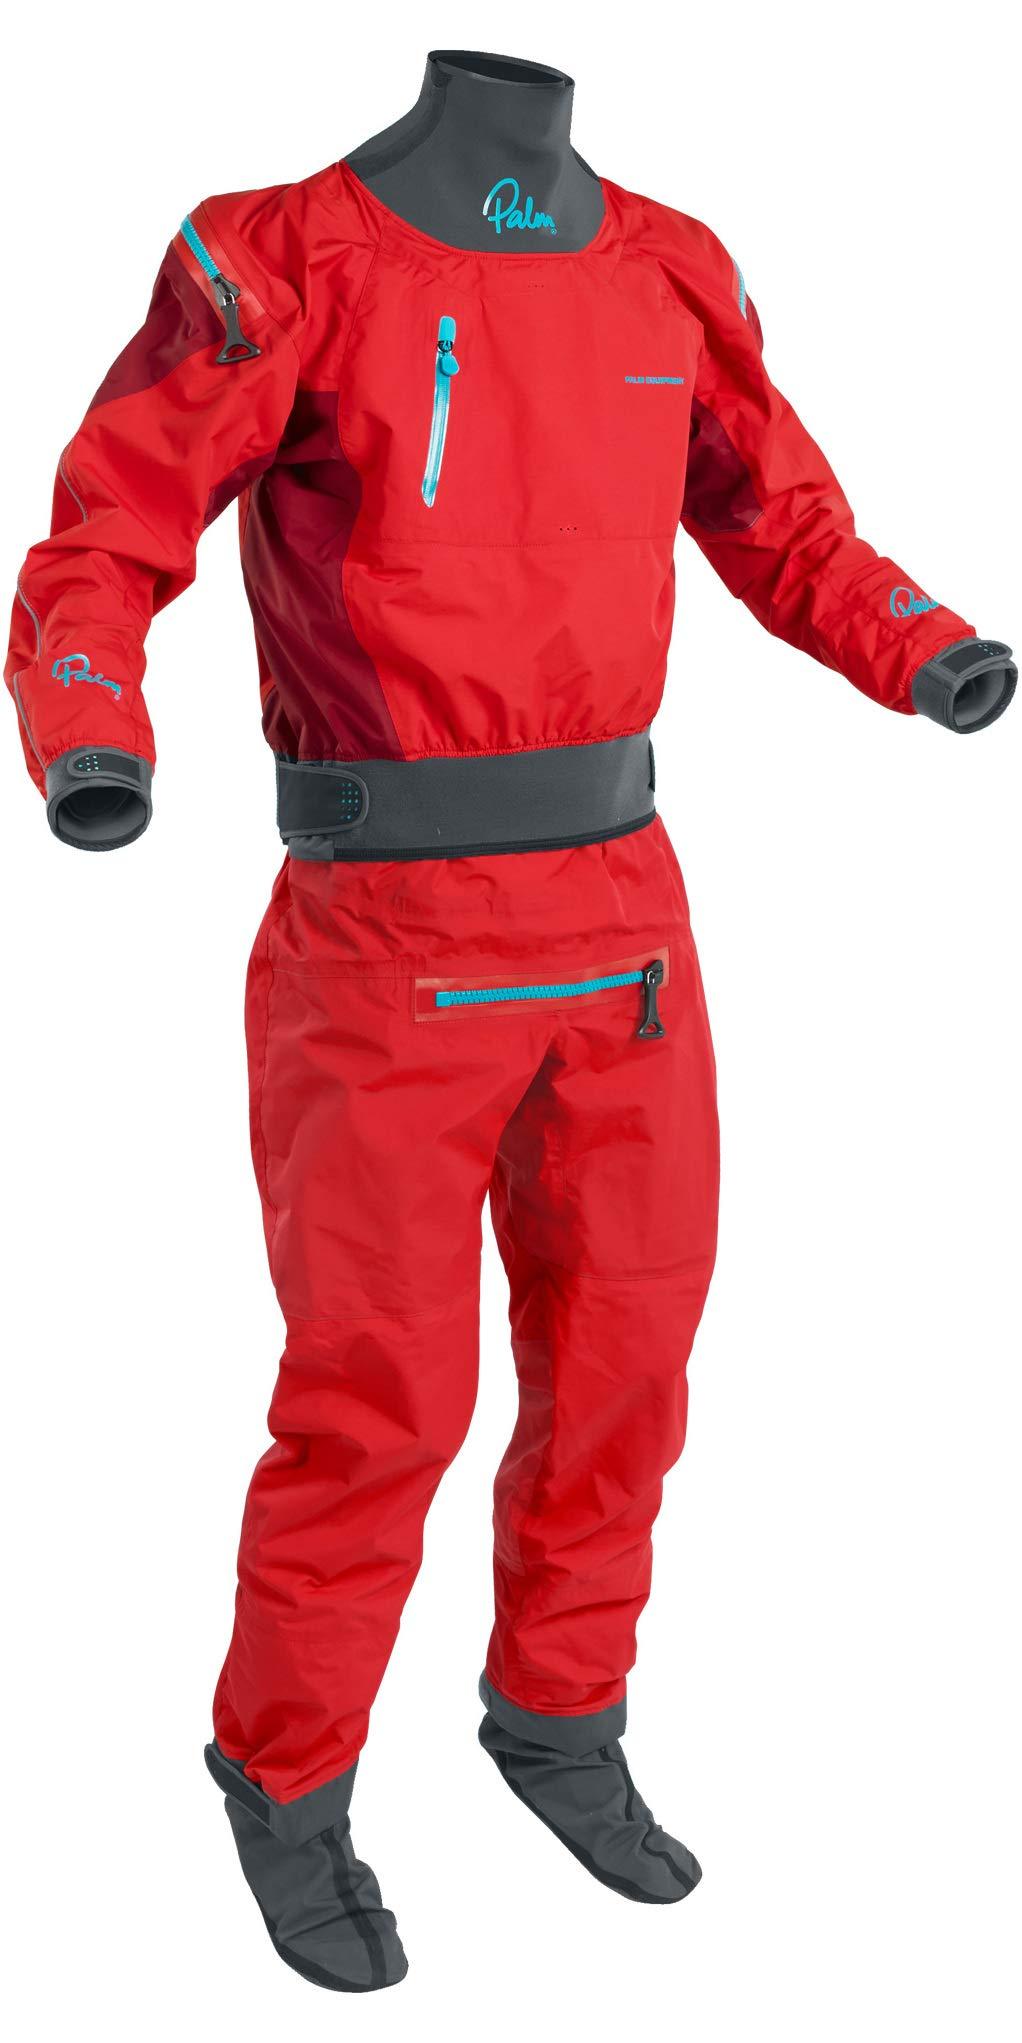 Palm 2019 Mens Atom Back Zip Kayak Drysuit + CON Zip Flame/Chilli 12380 Drysuit Size - S by Palm